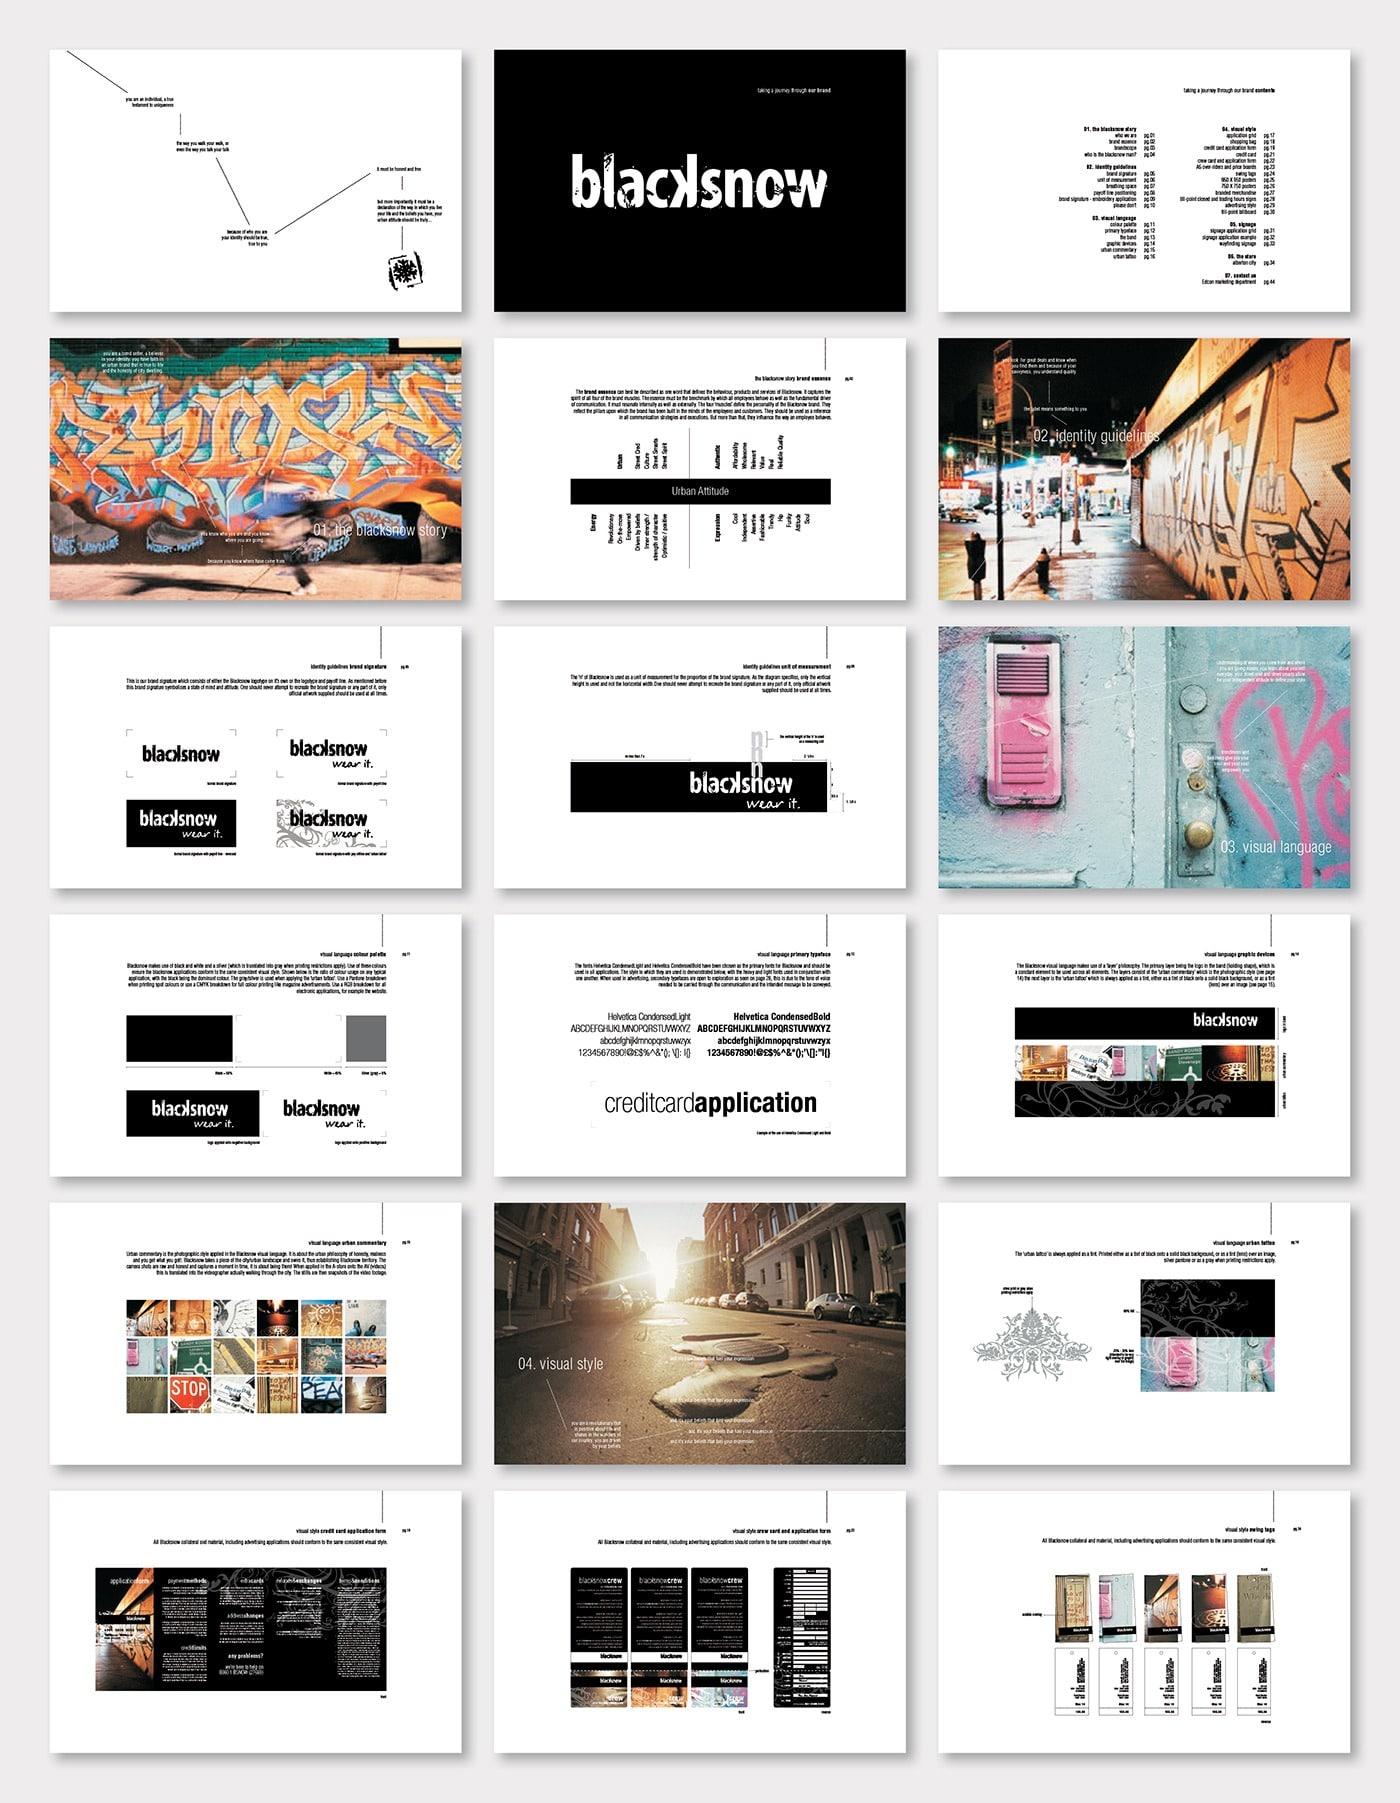 Ci manual ci manual book design array mrs smith ci manuals rh mrssmith fandeluxe Images